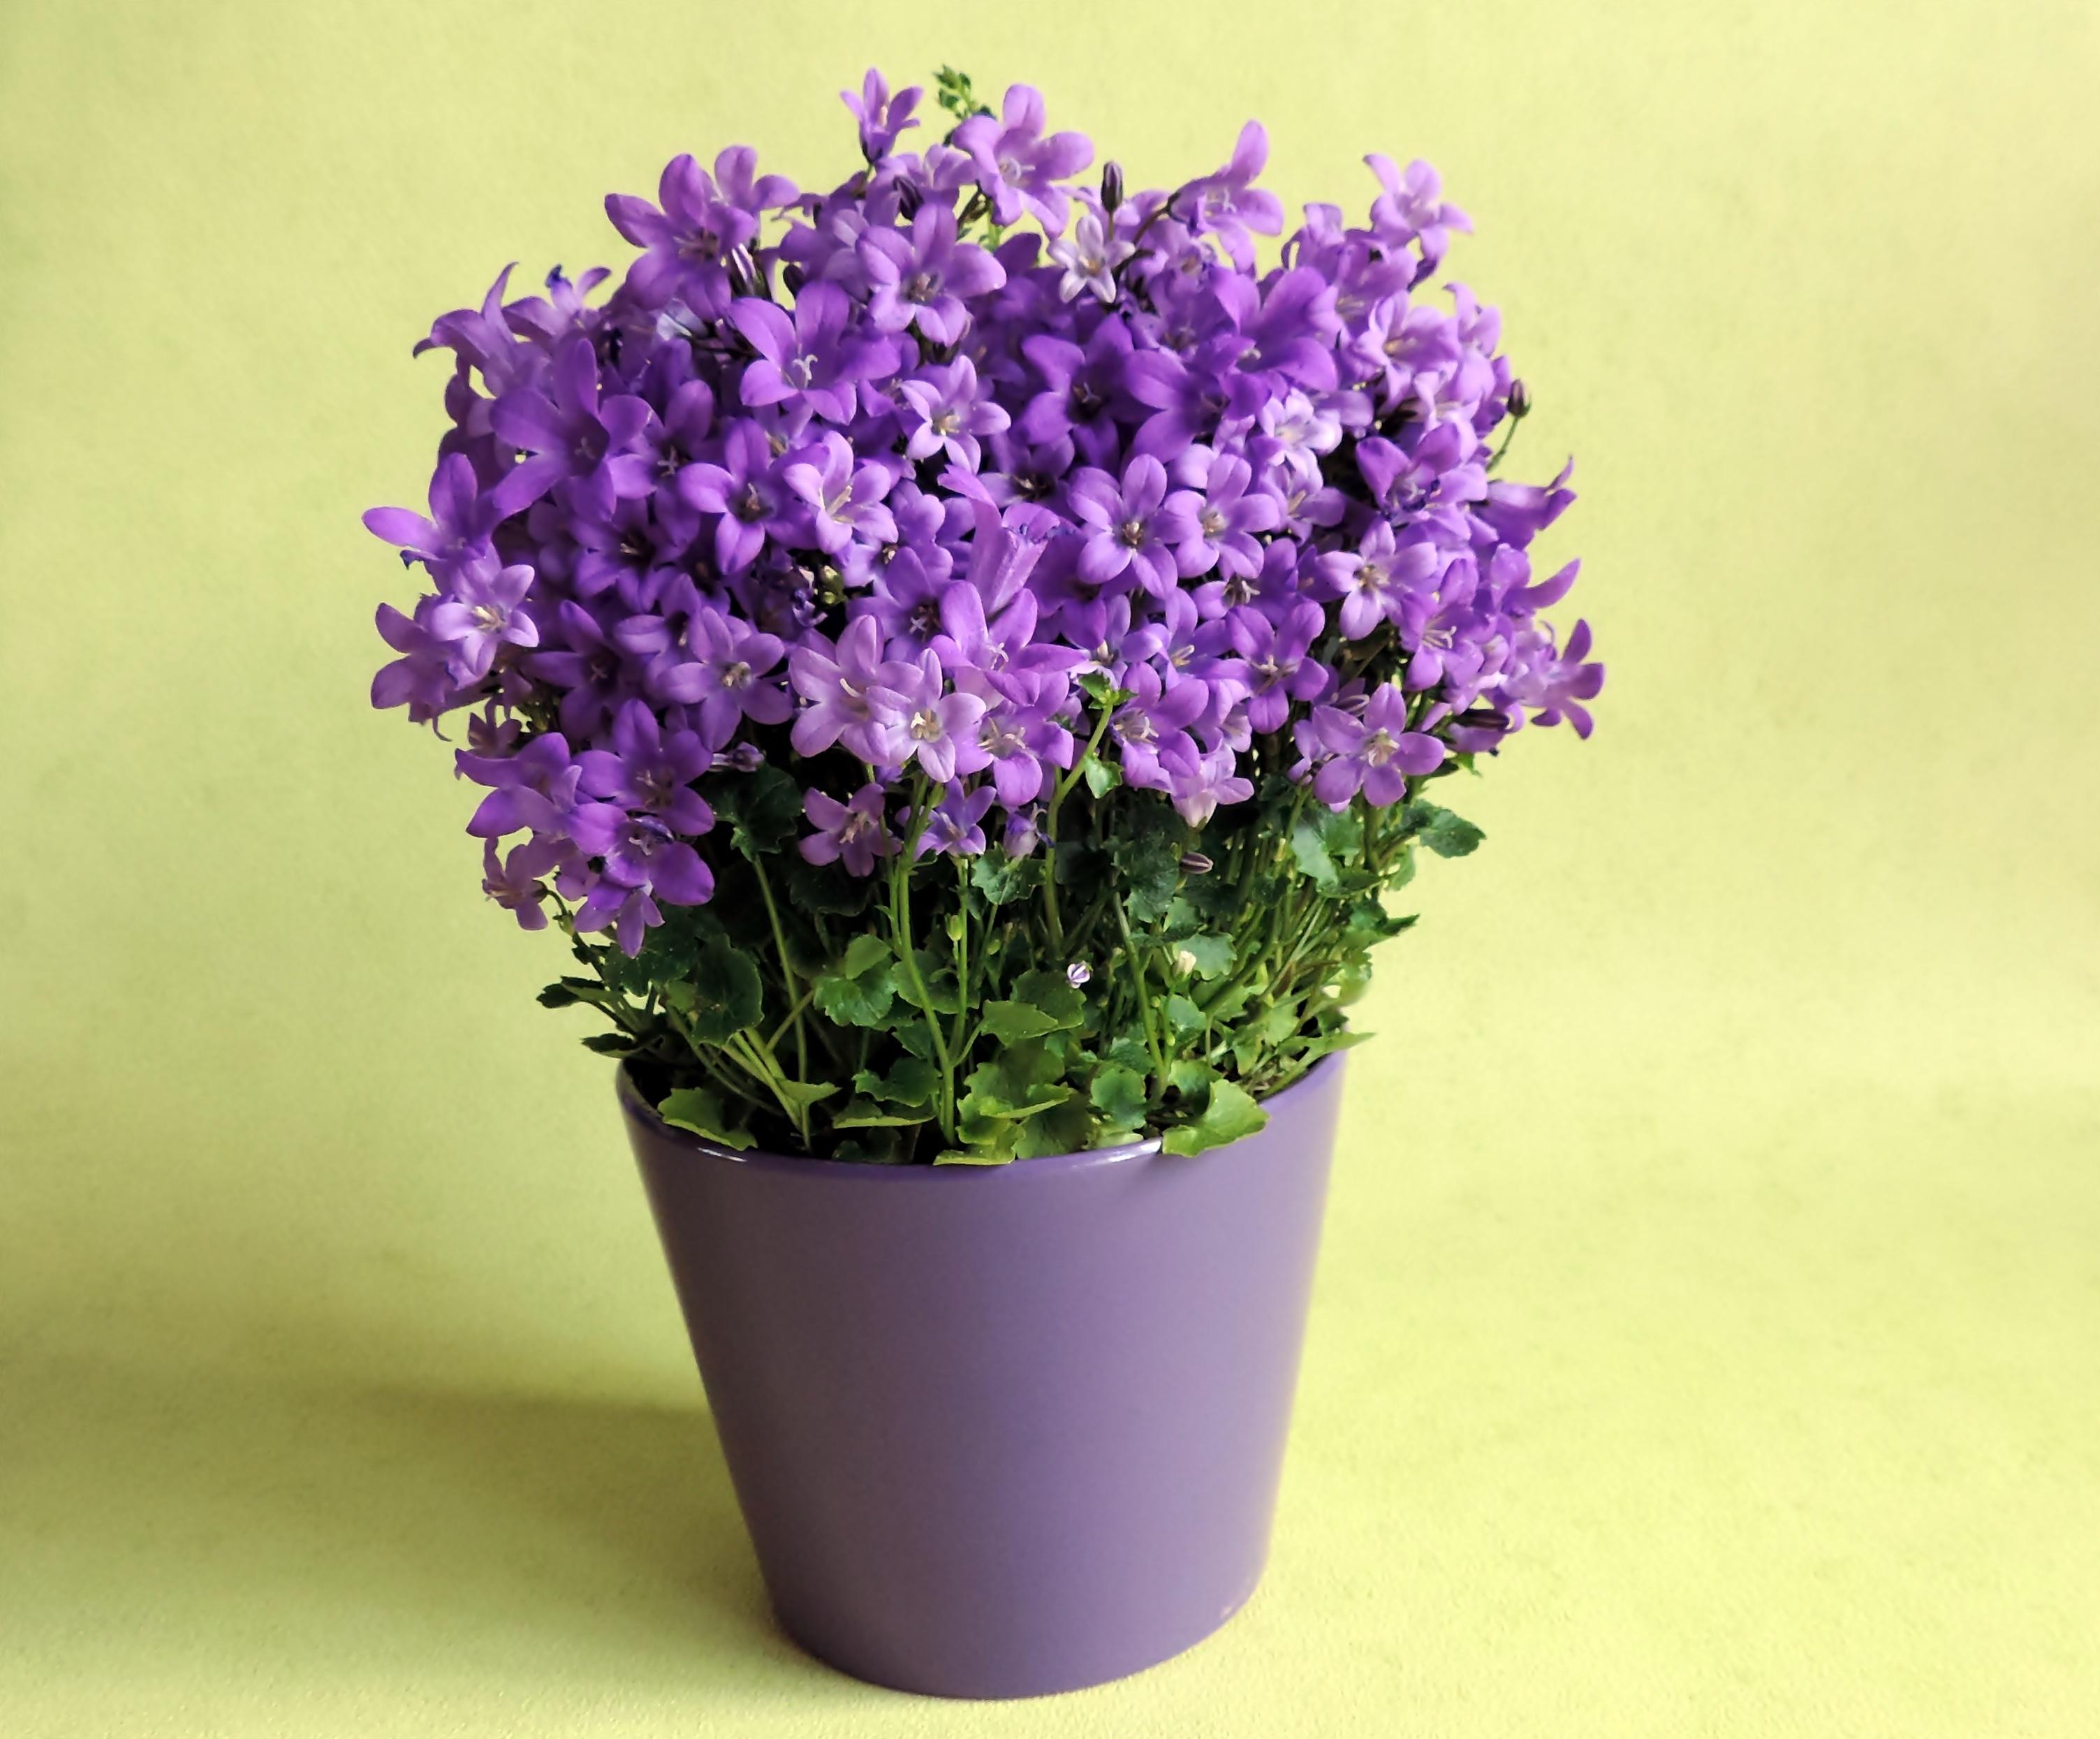 Plant Flower Purple Lavender Flowers Pot Potted Violet Flowerpot Hyacinth Flowering Land English